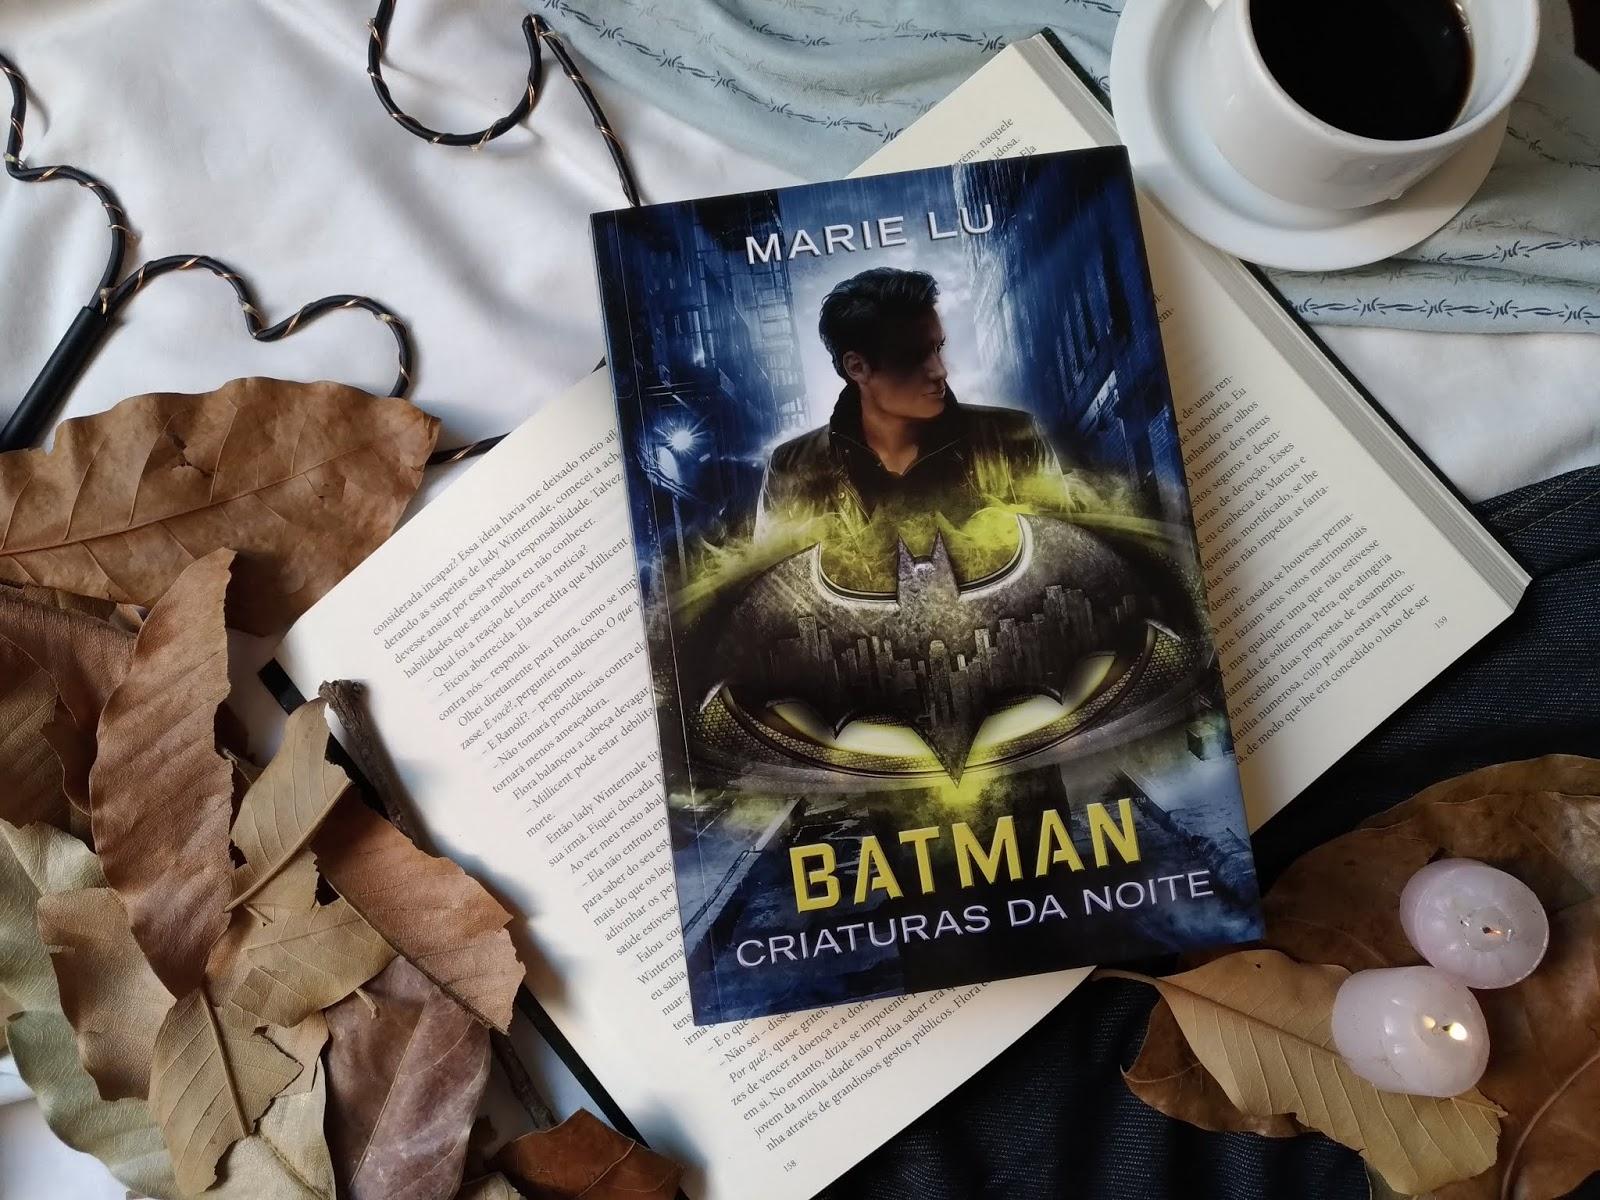 BATMAN: CRIATURAS DA NOITE - MARIE LU (LENDAS DA DC #2)